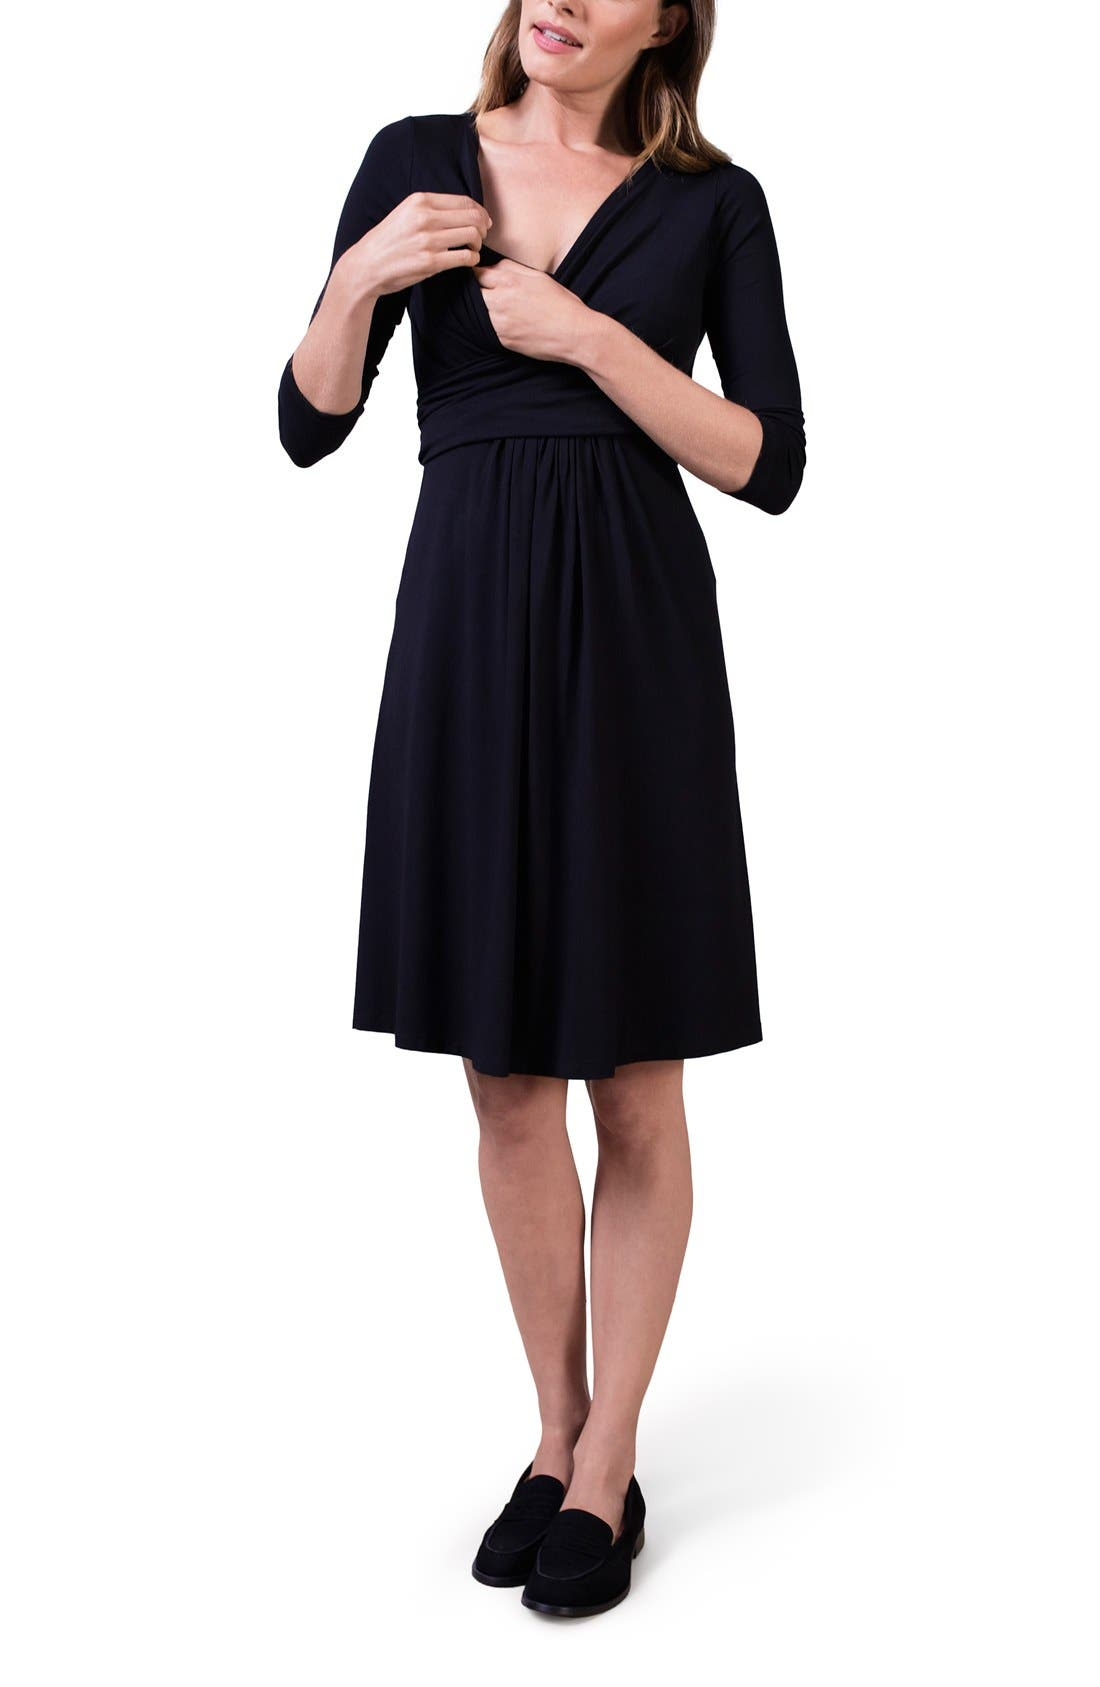 ISABELLA OLIVER,                             'Avebury' Nursing Wrap Maternity Dress,                             Alternate thumbnail 2, color,                             001